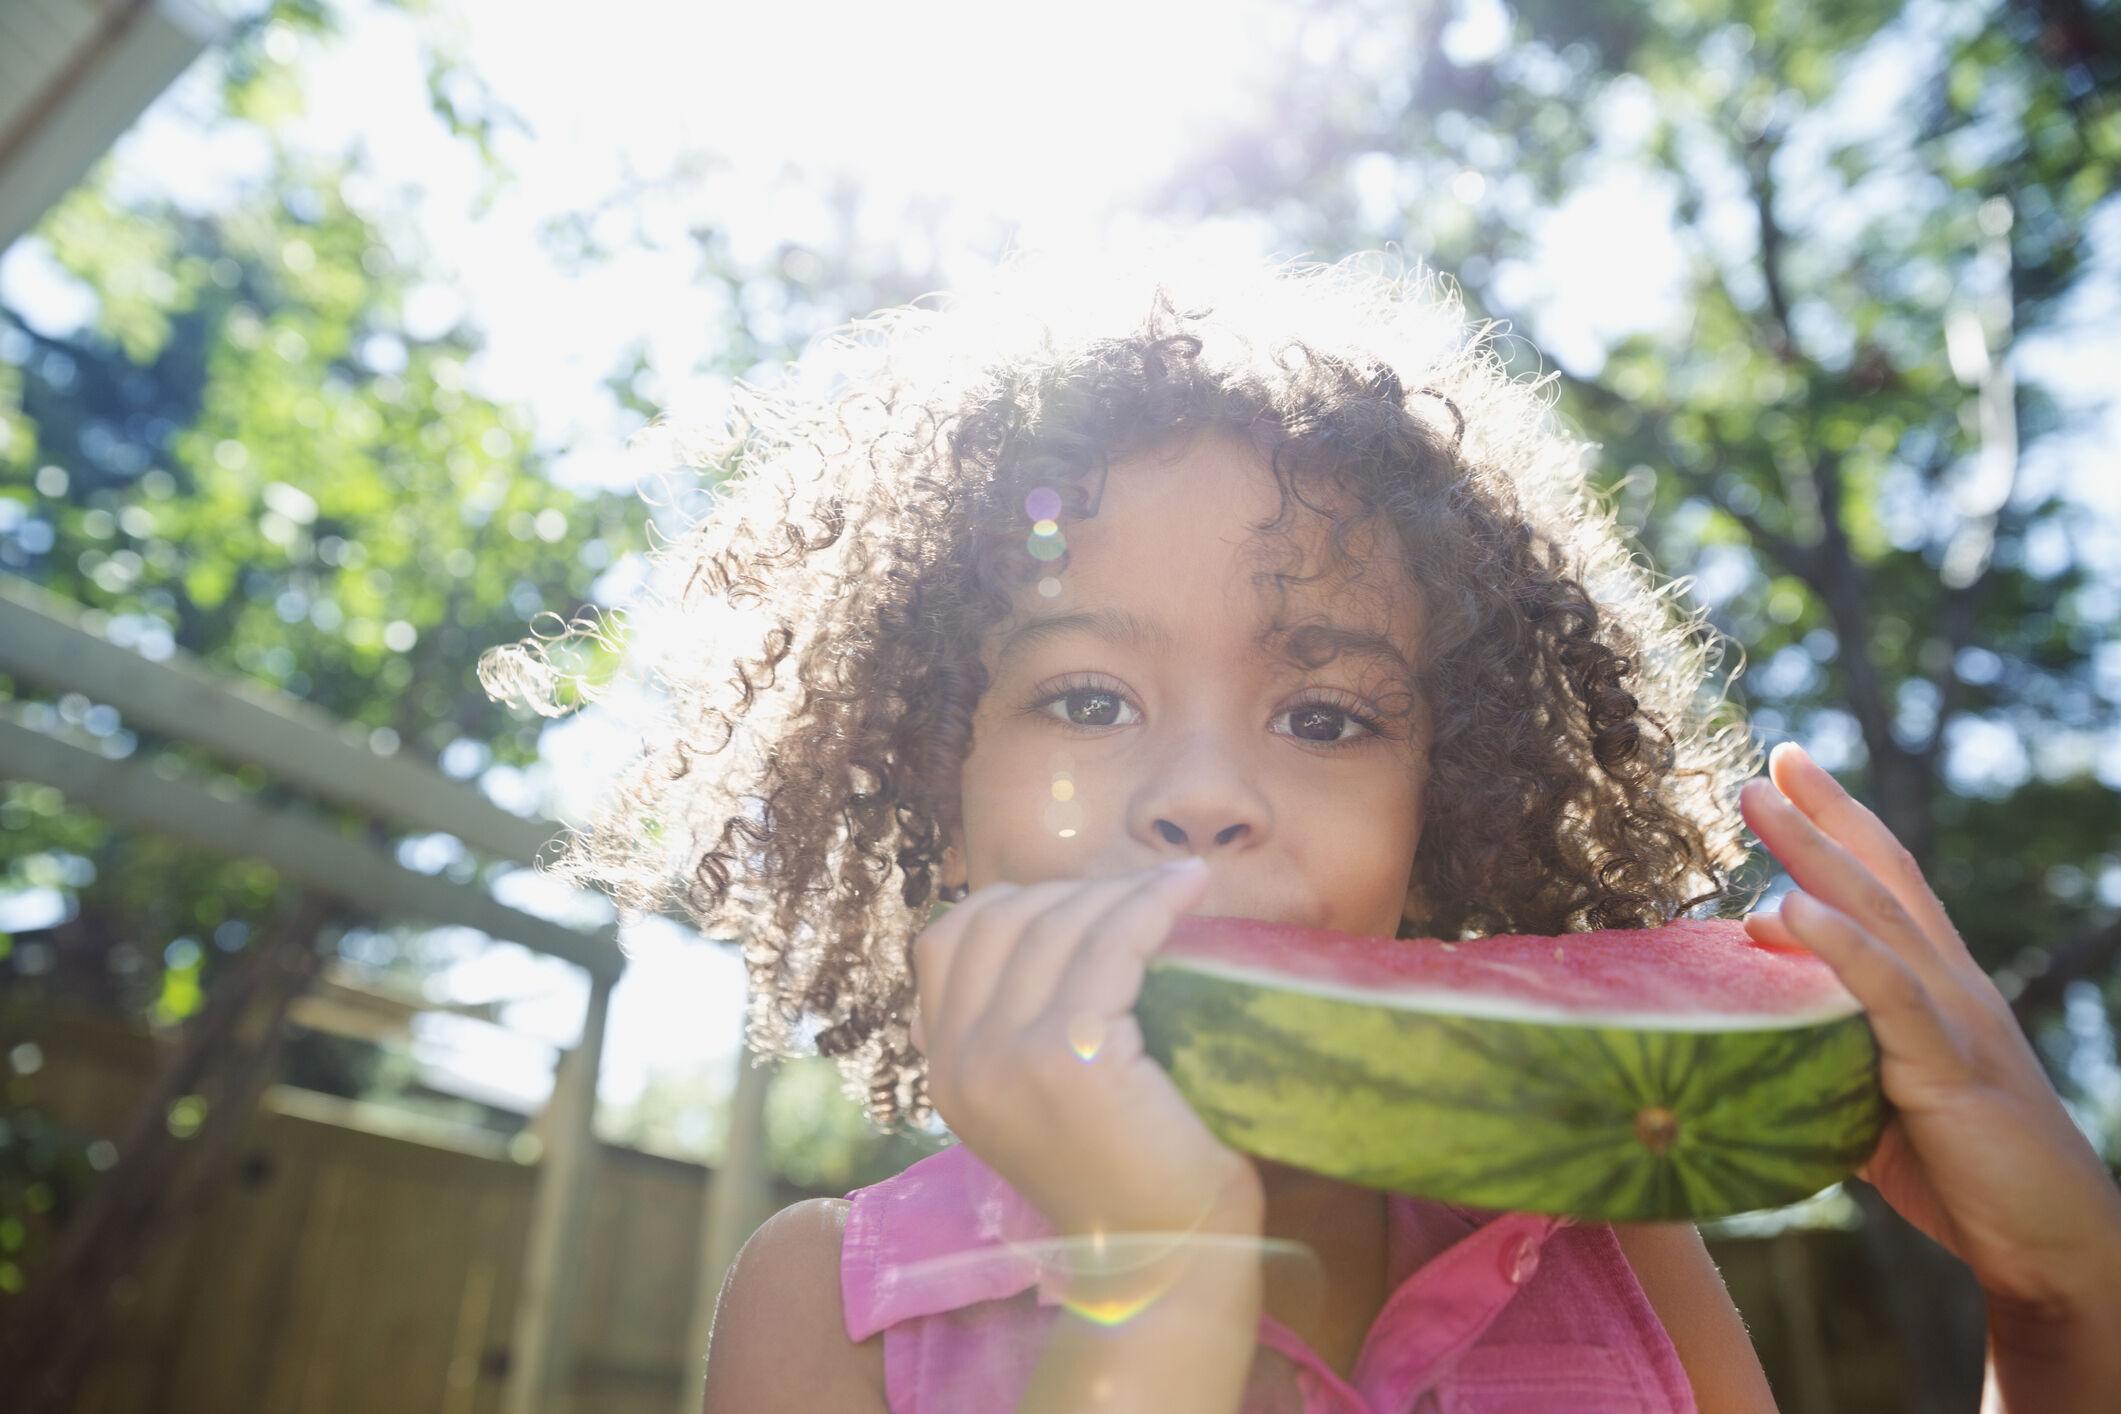 Hábitos saudáveis na infância